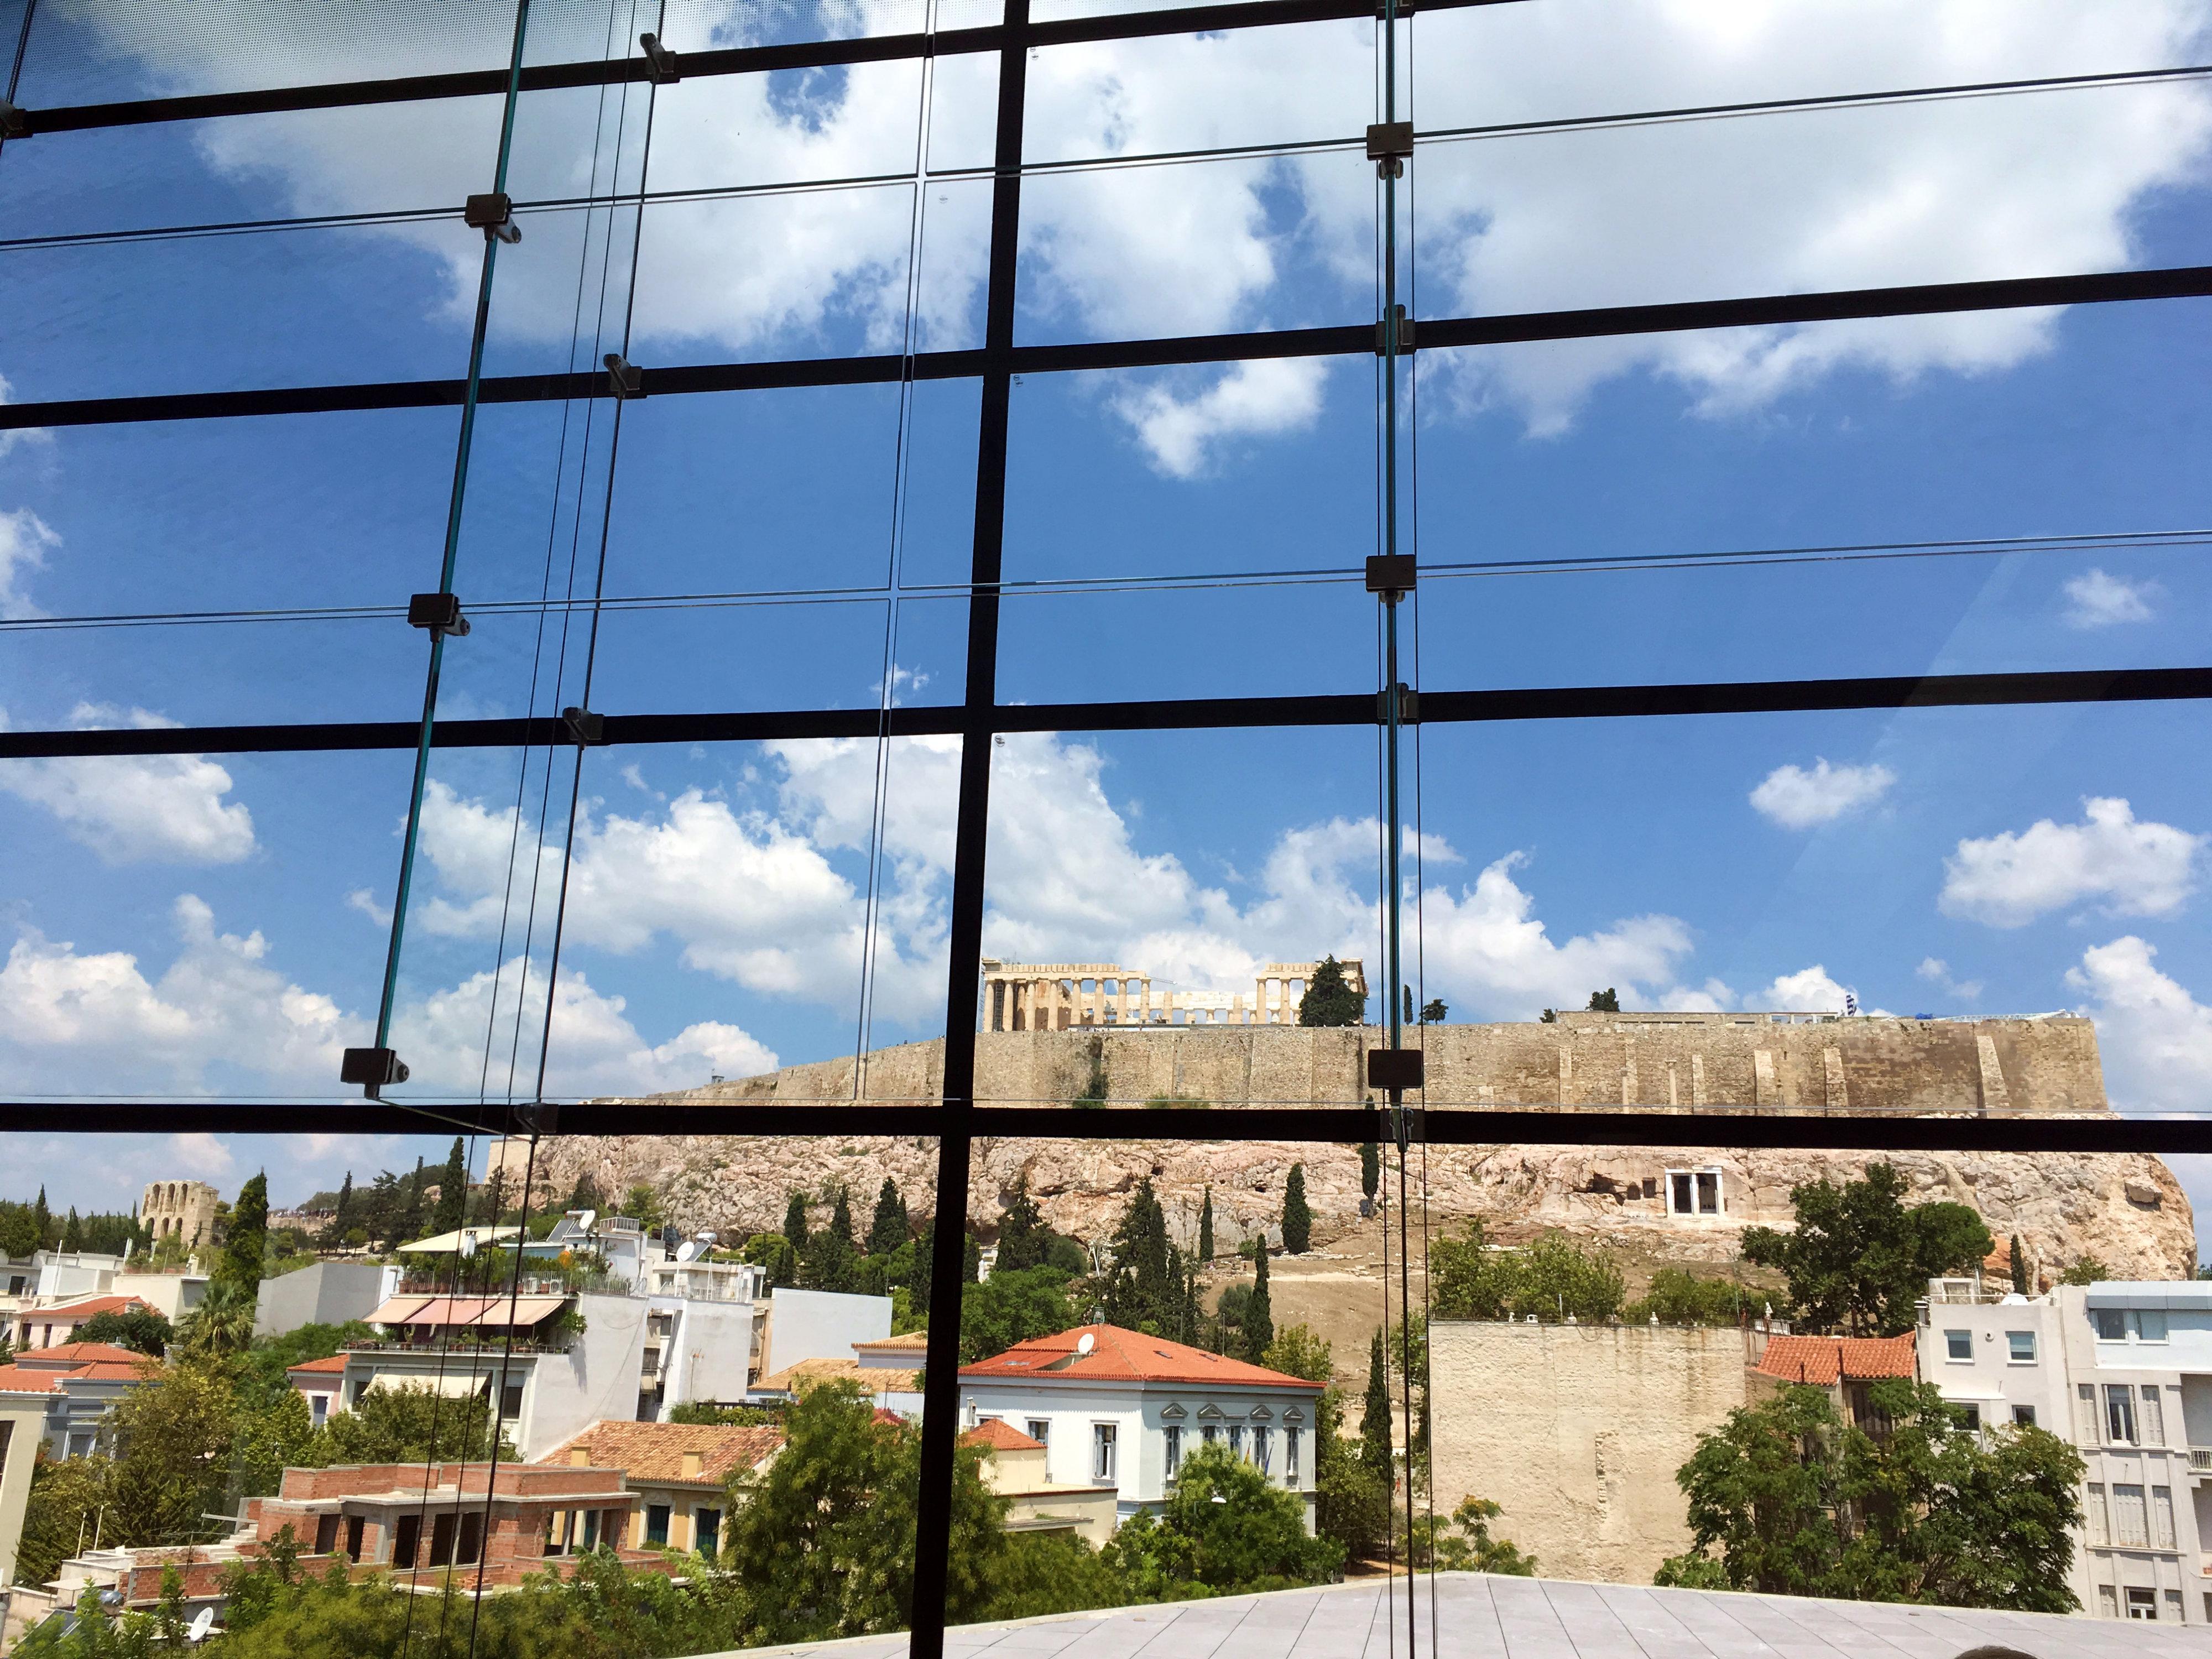 Athenas - Acropole Museum